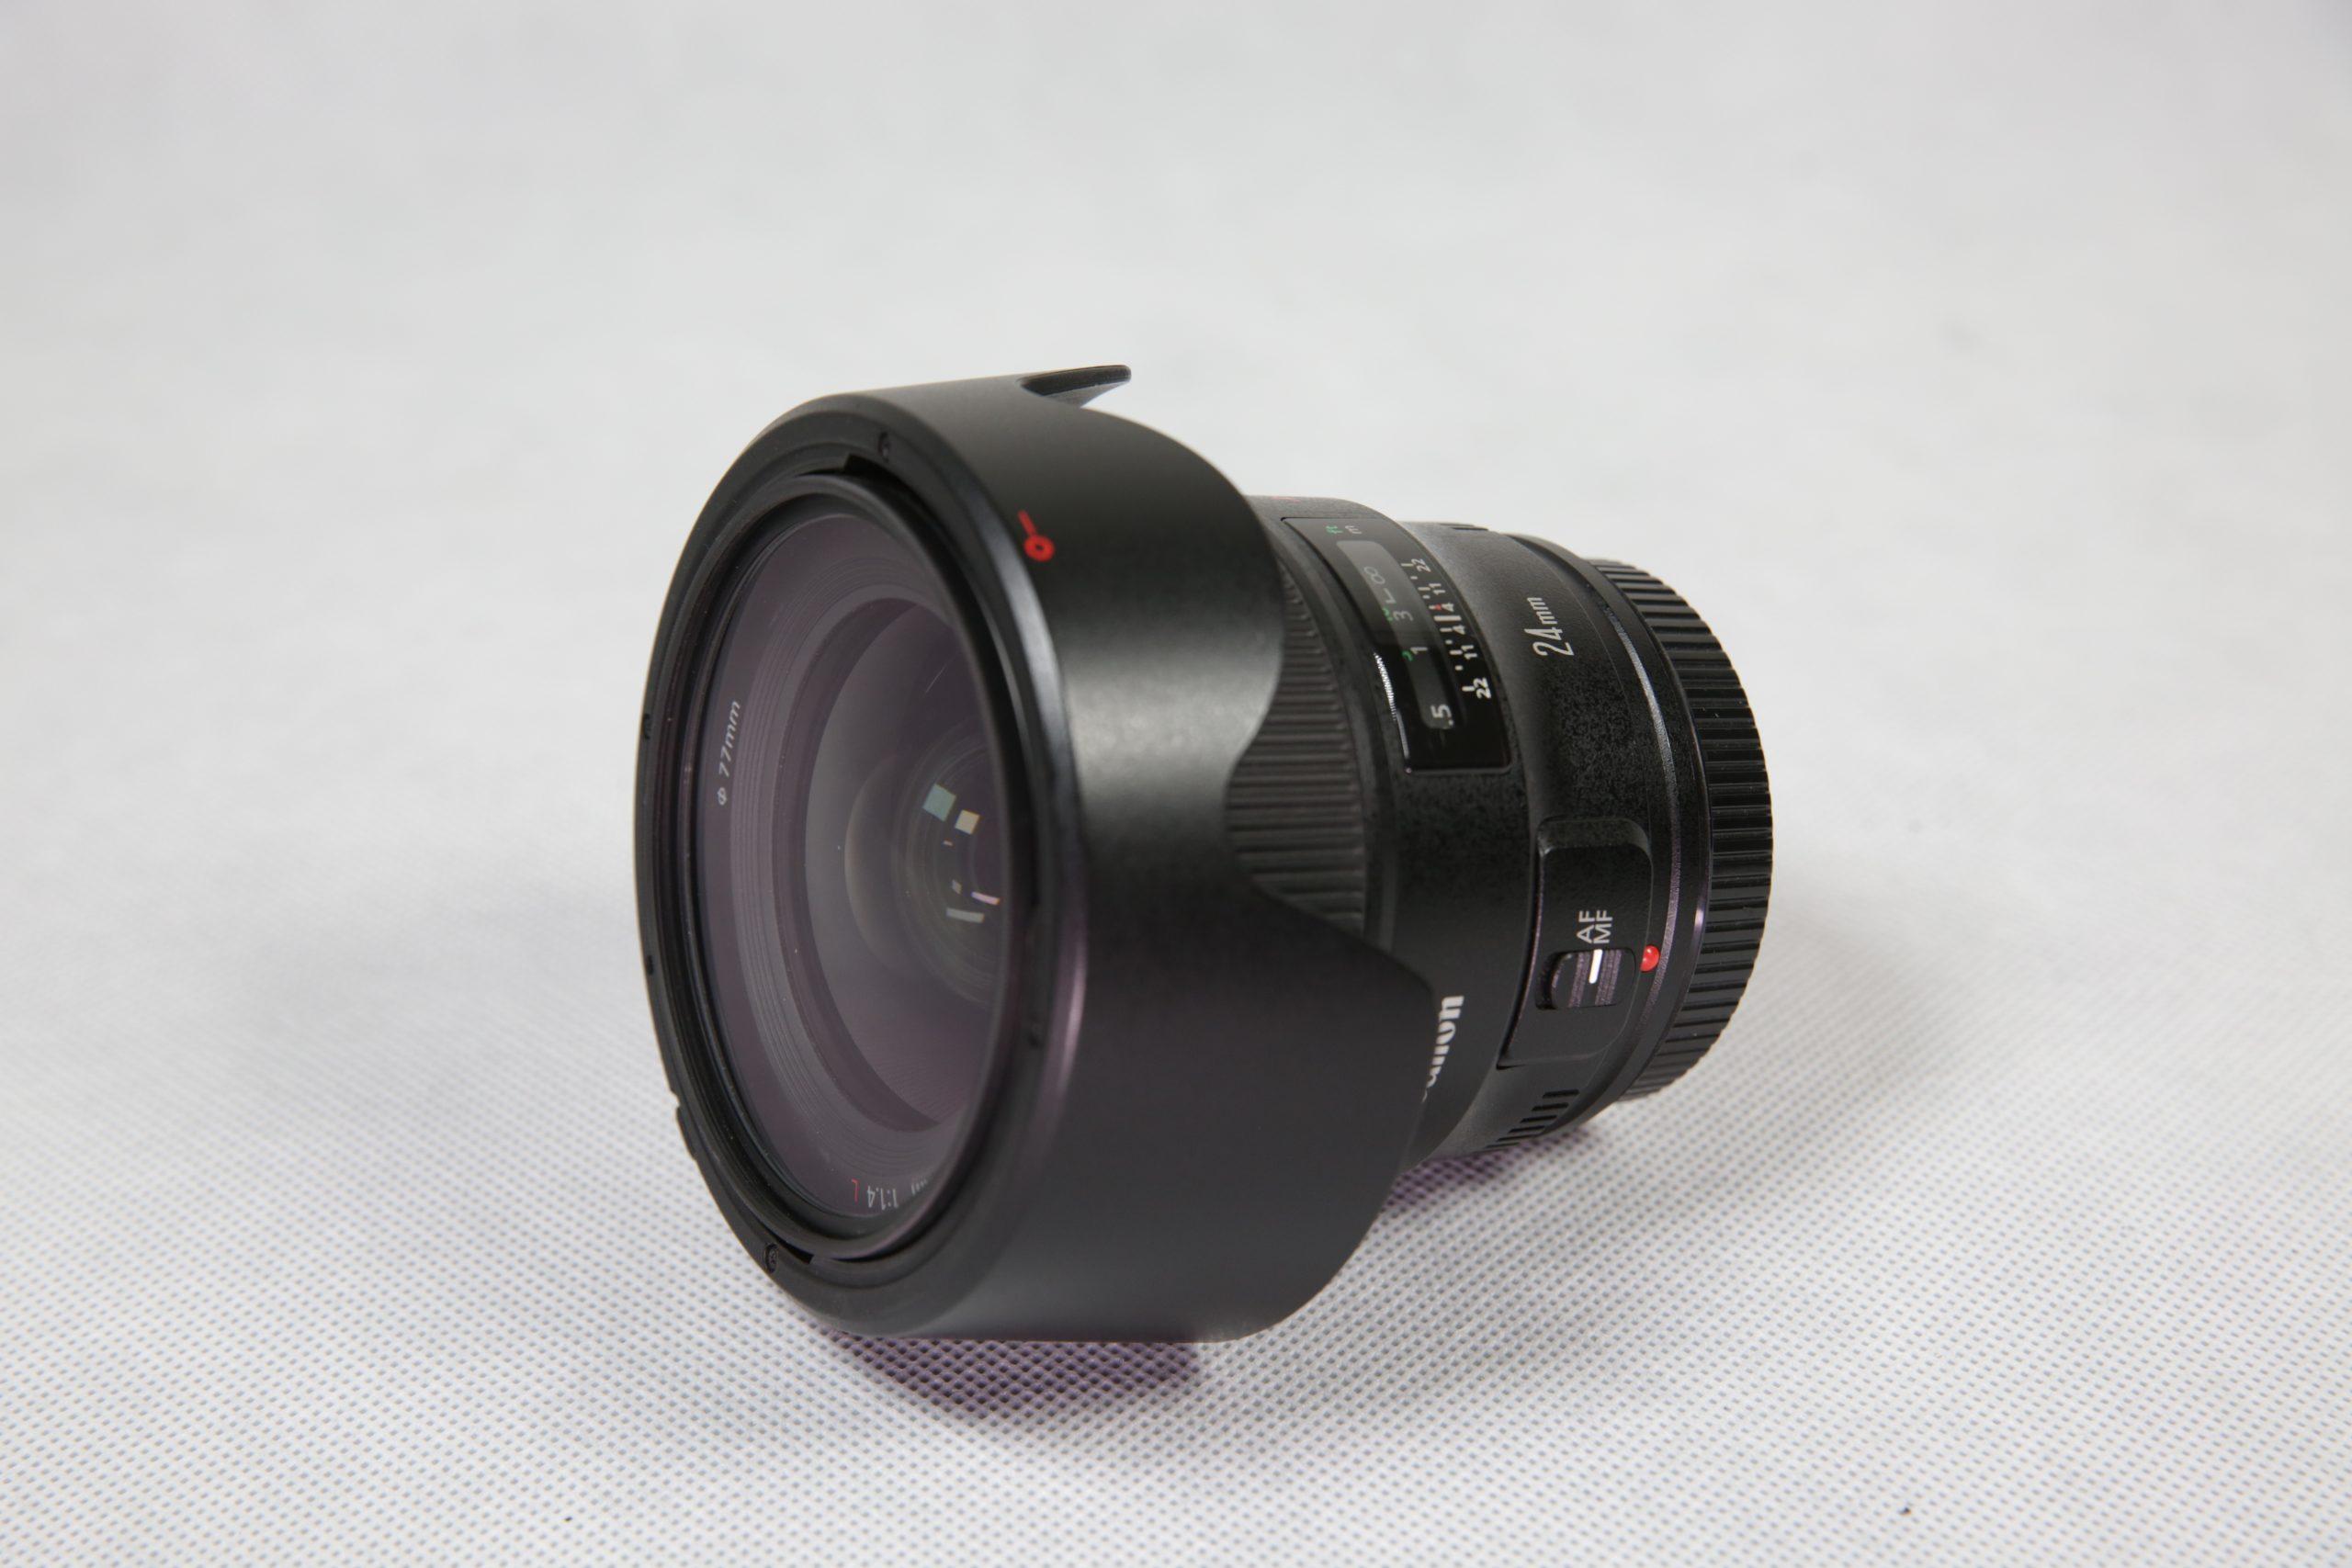 Canon 24mm f1.4 II USM